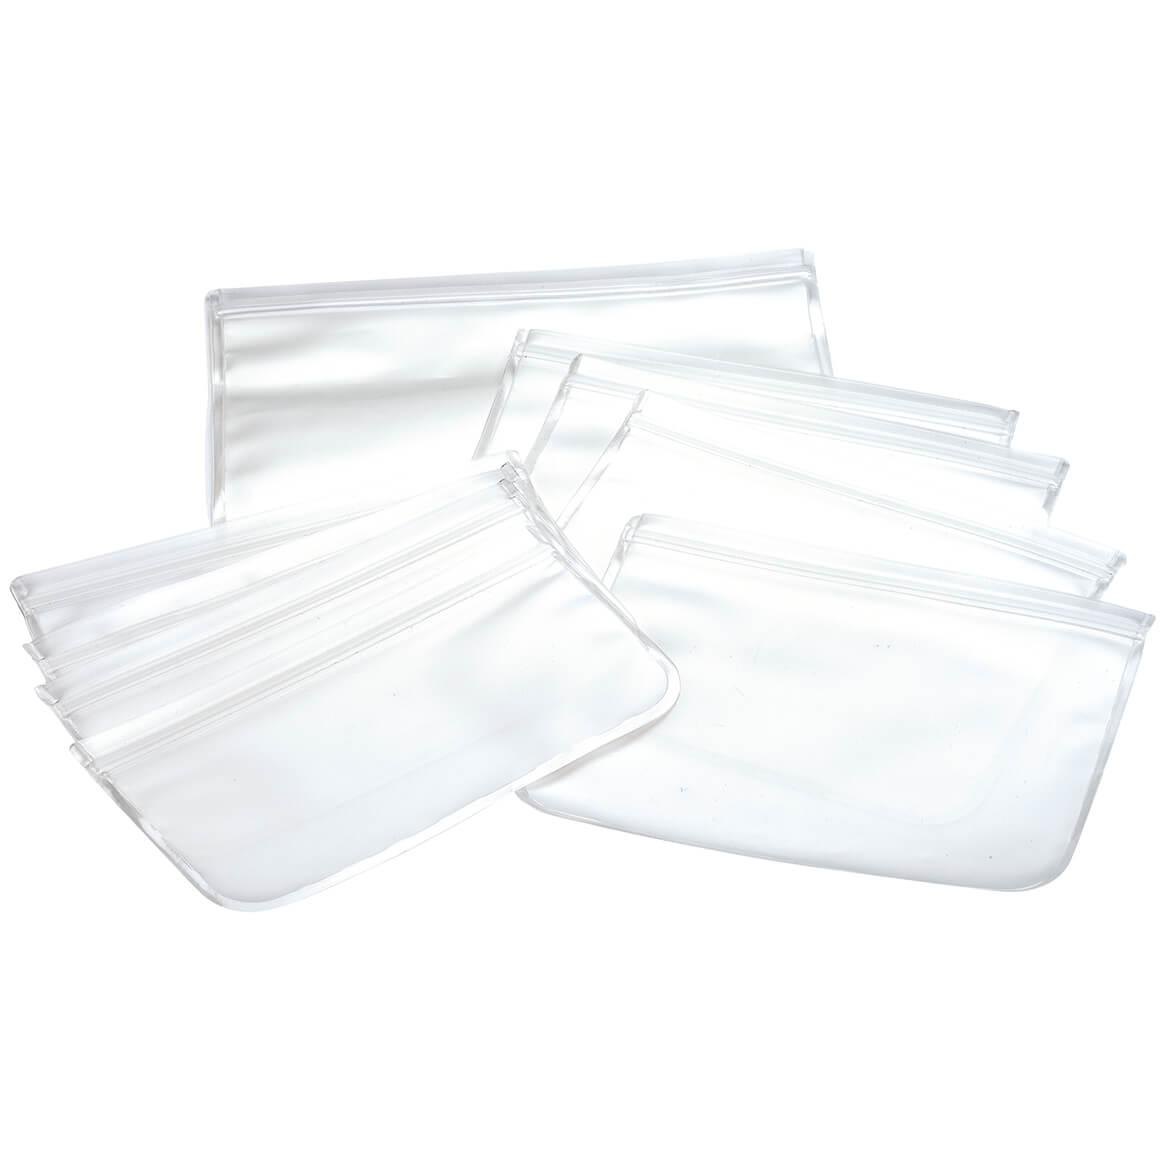 10-Piece Reusable Silicone Storage Bags-370752